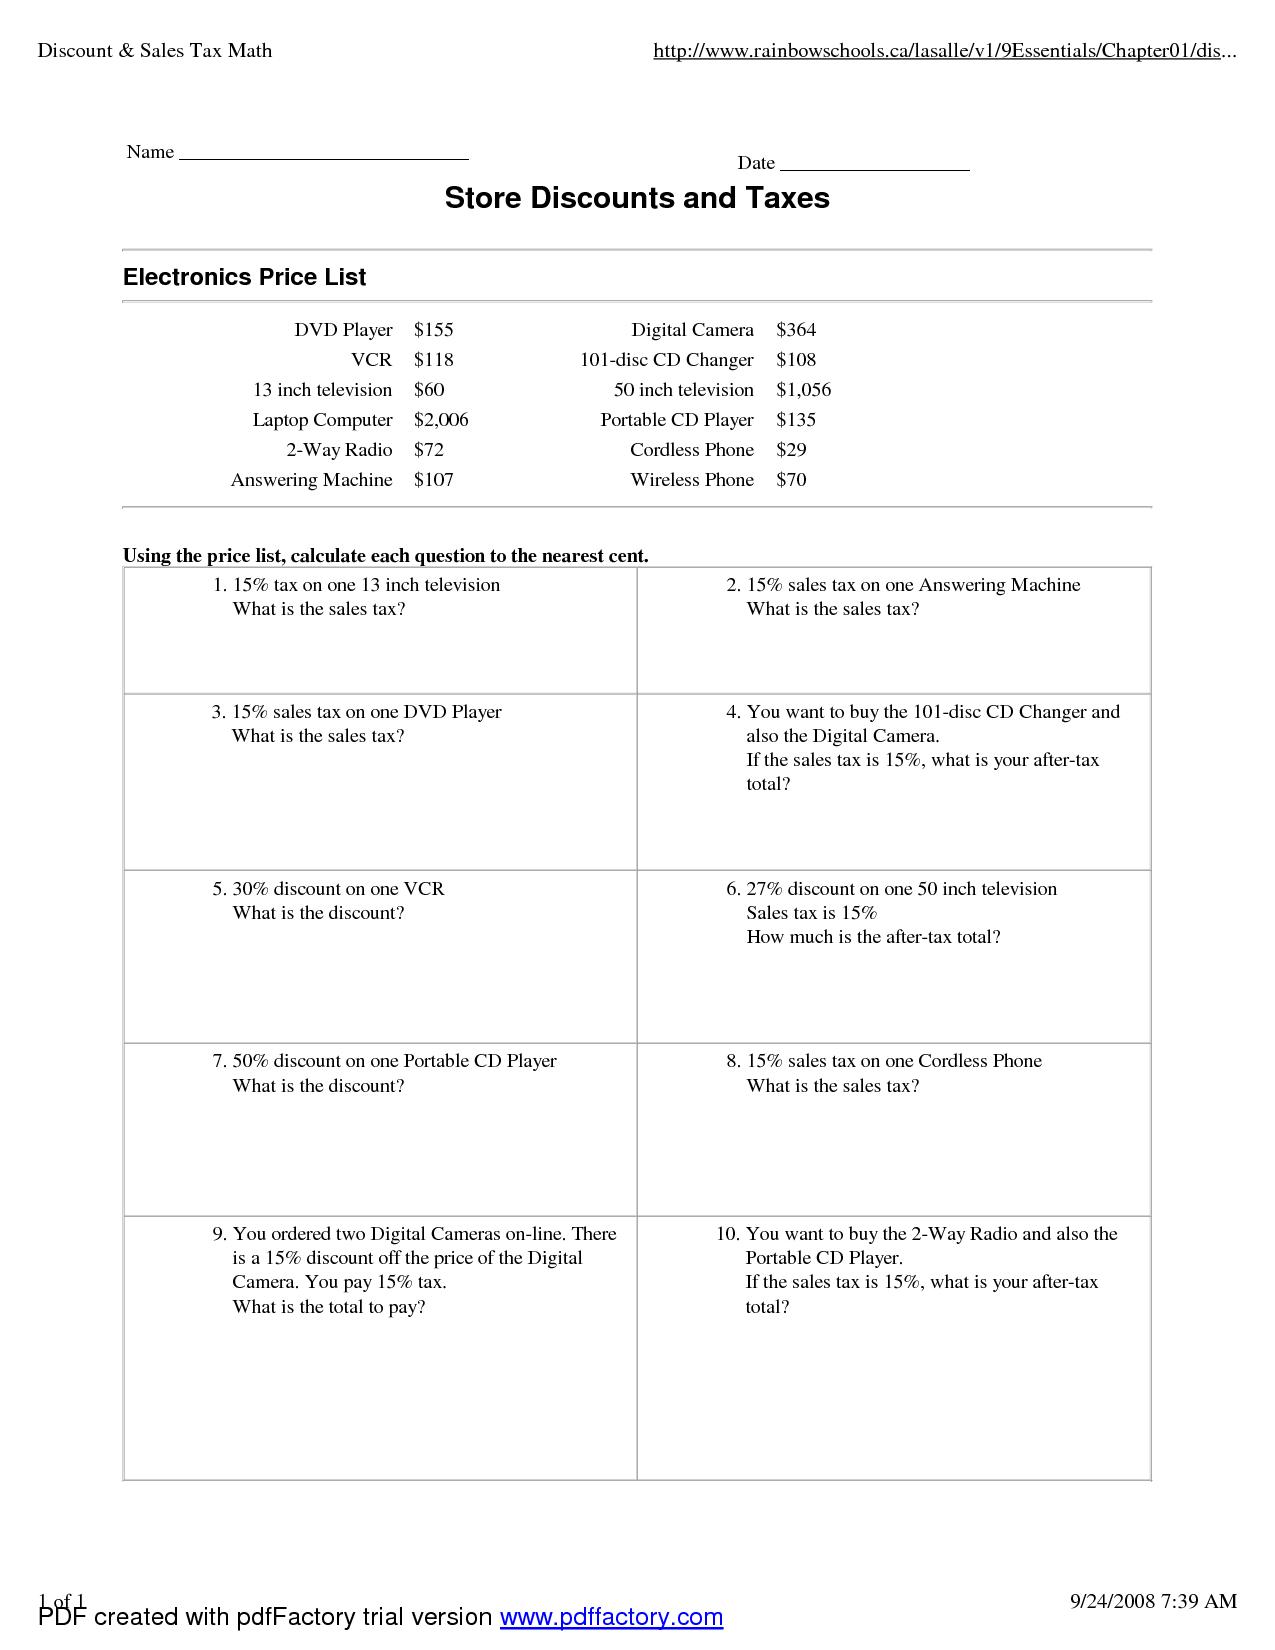 Worksheets Sales Tax Worksheet tax problems worksheet sales problems